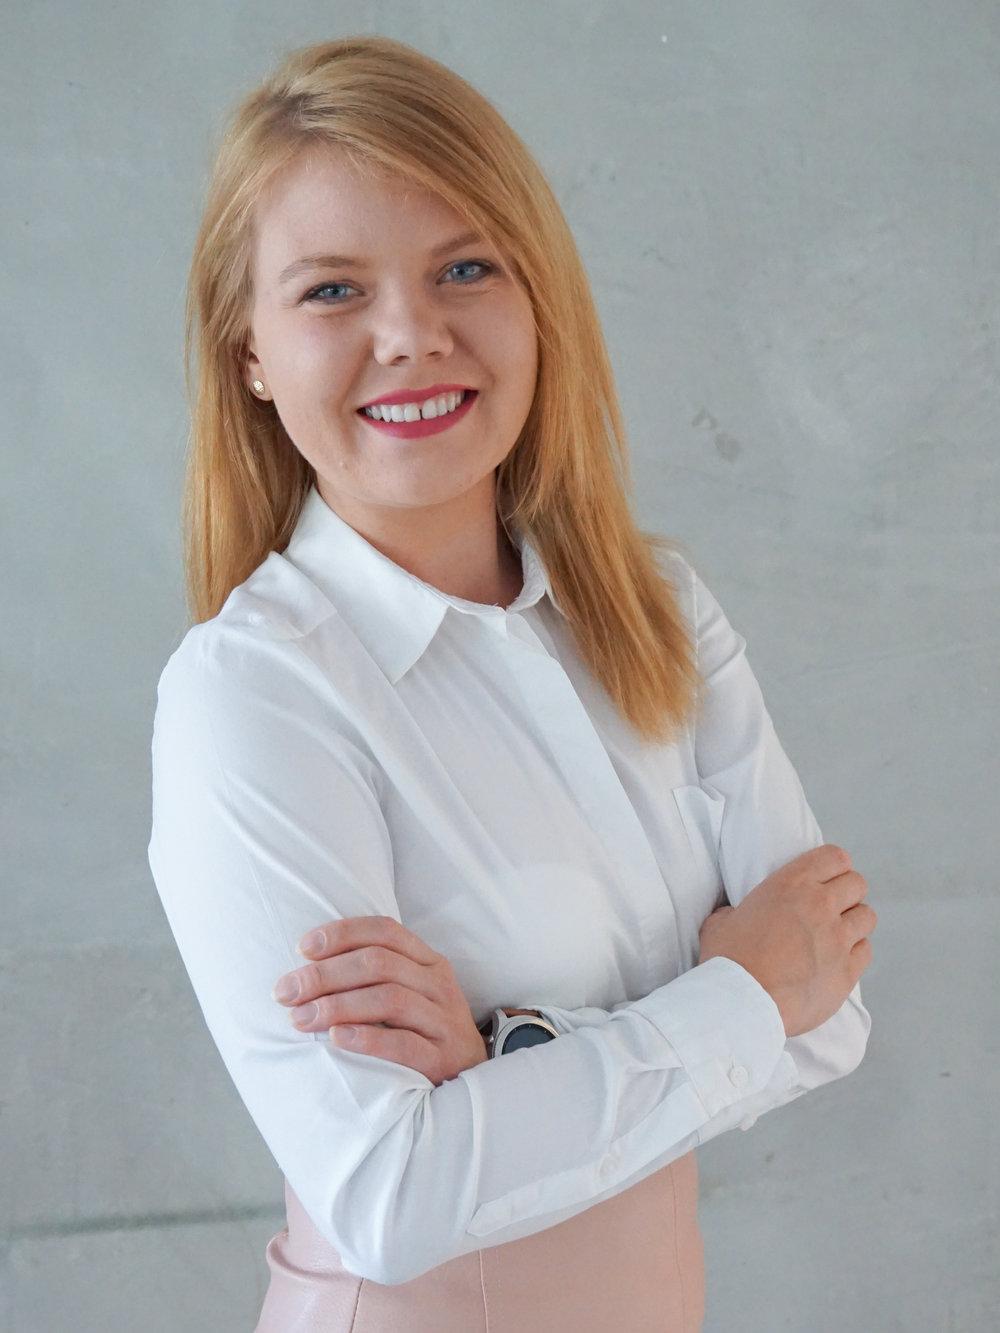 <p><b>Dorota Bacal</b><br>PhD student<br>Monash University</p>